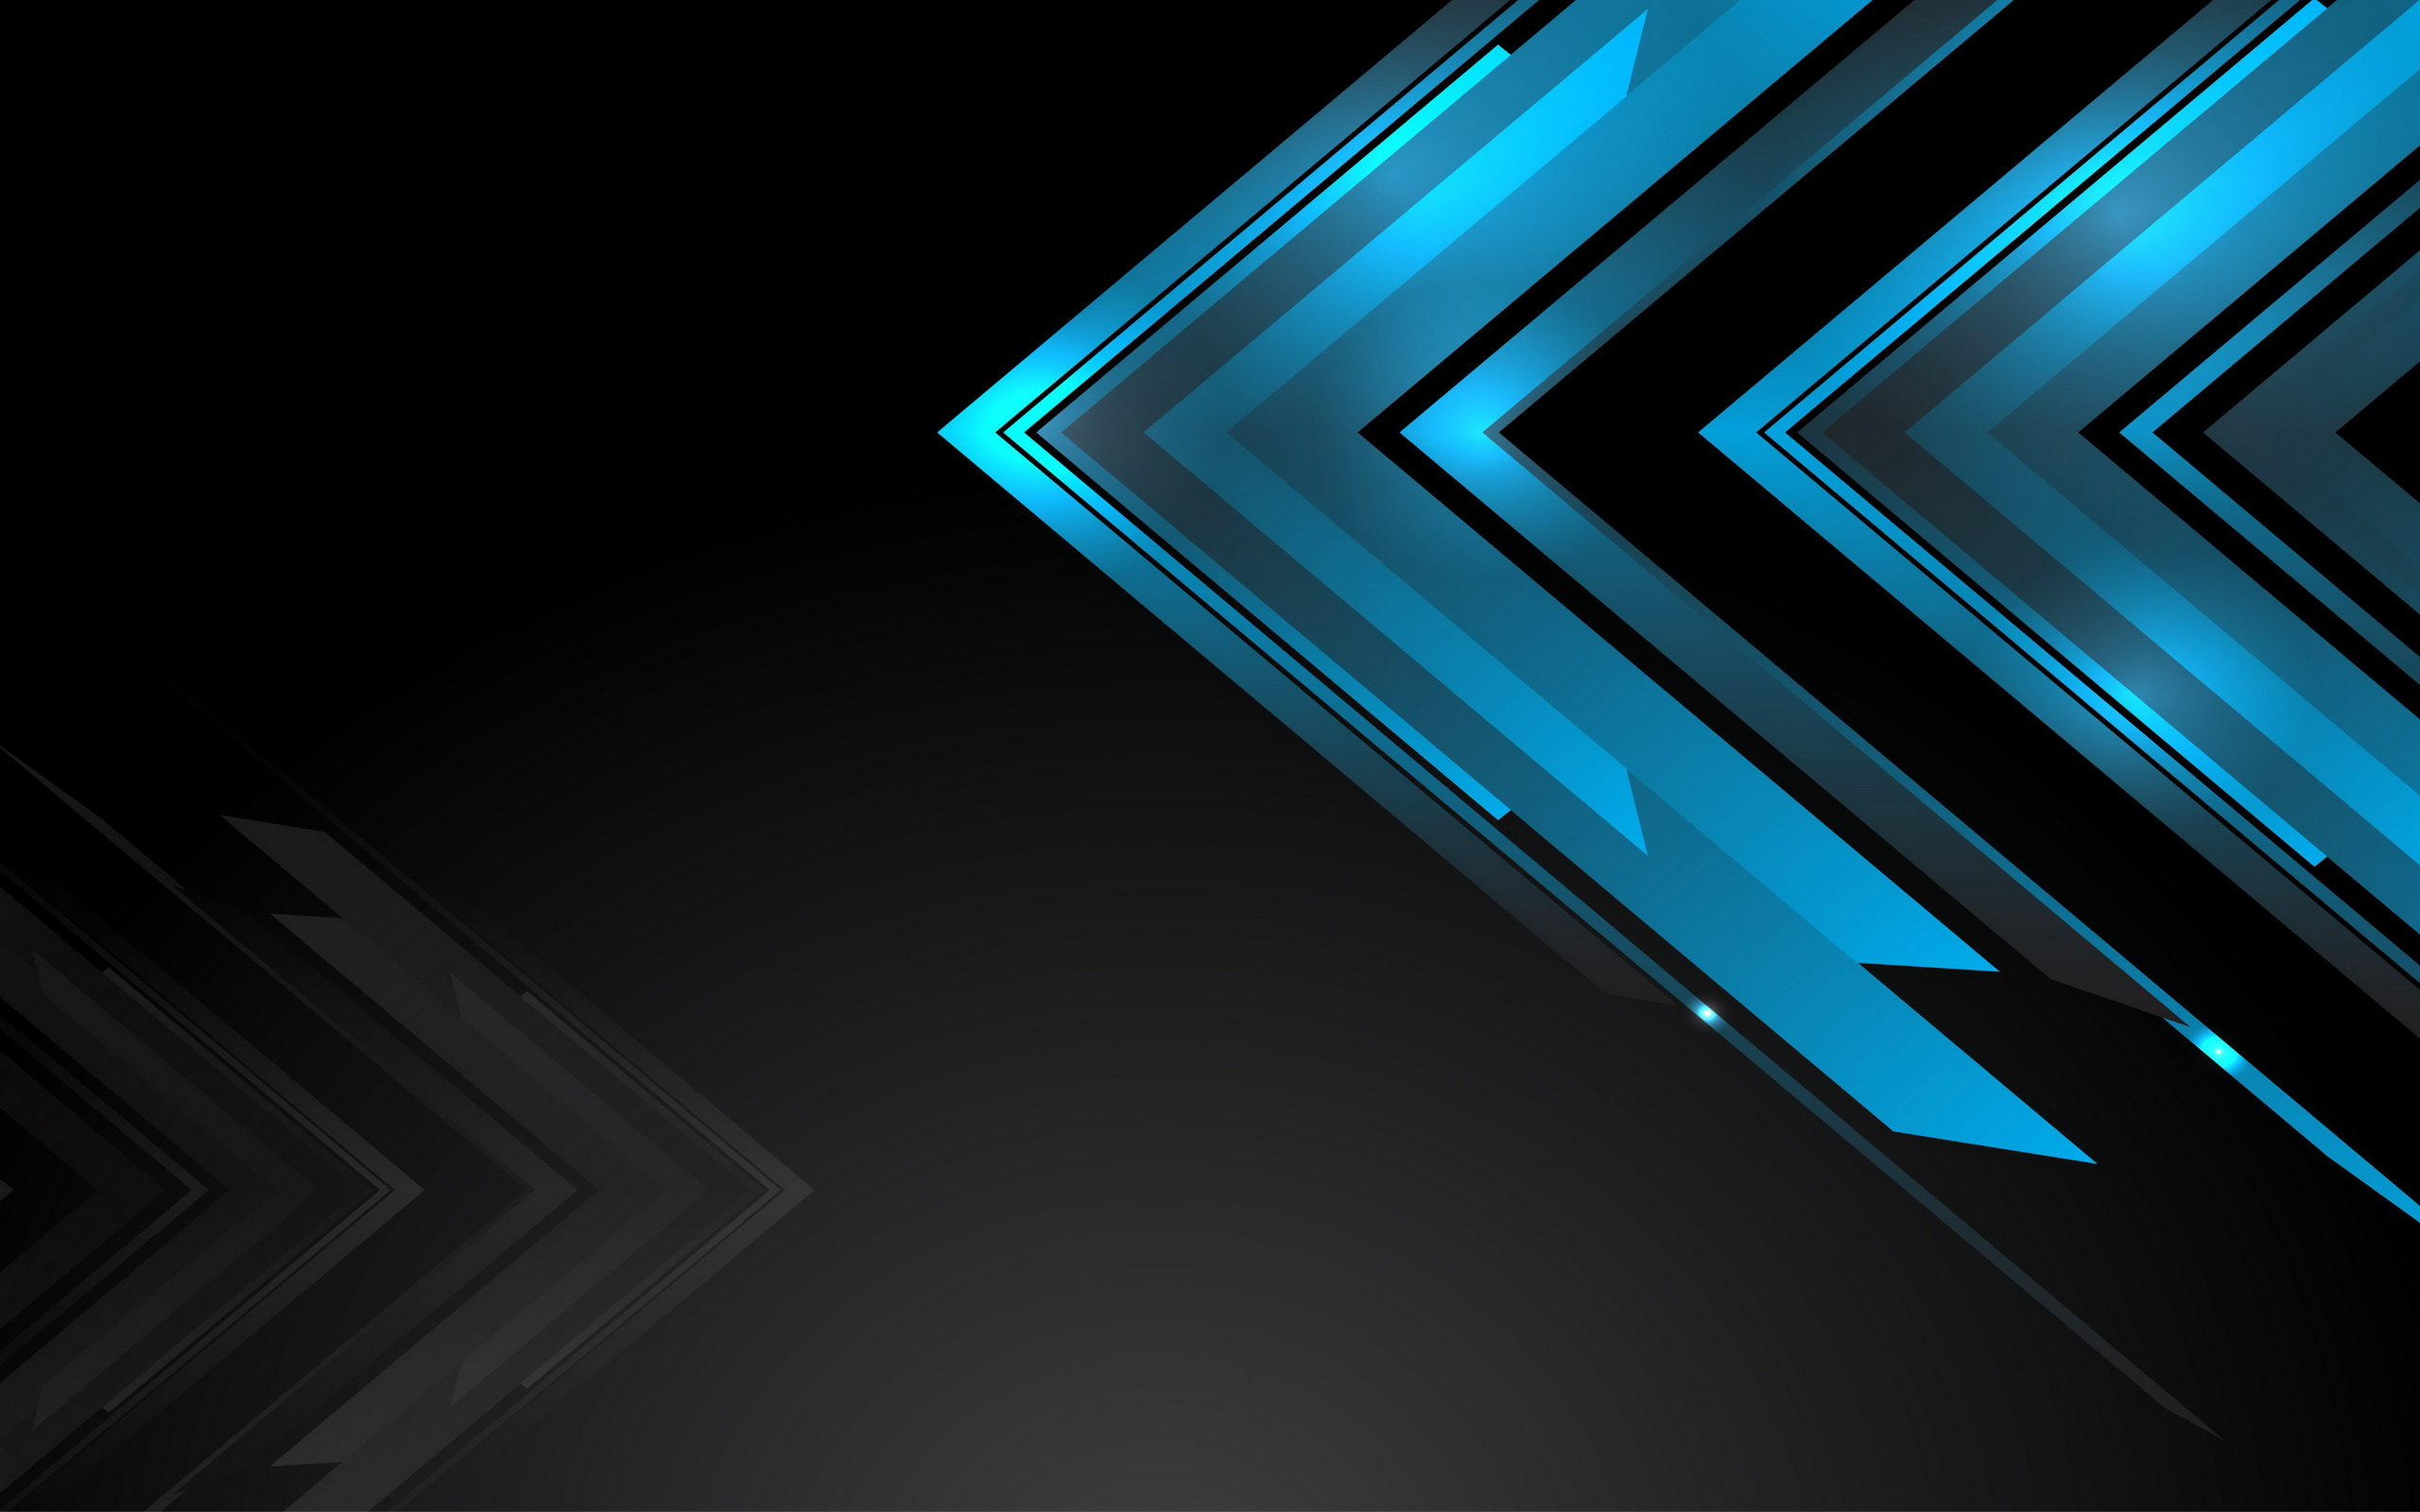 Mobile Wallpaper Inspirational Quotes Hd Black And Blue Backgrounds Pixelstalk Net